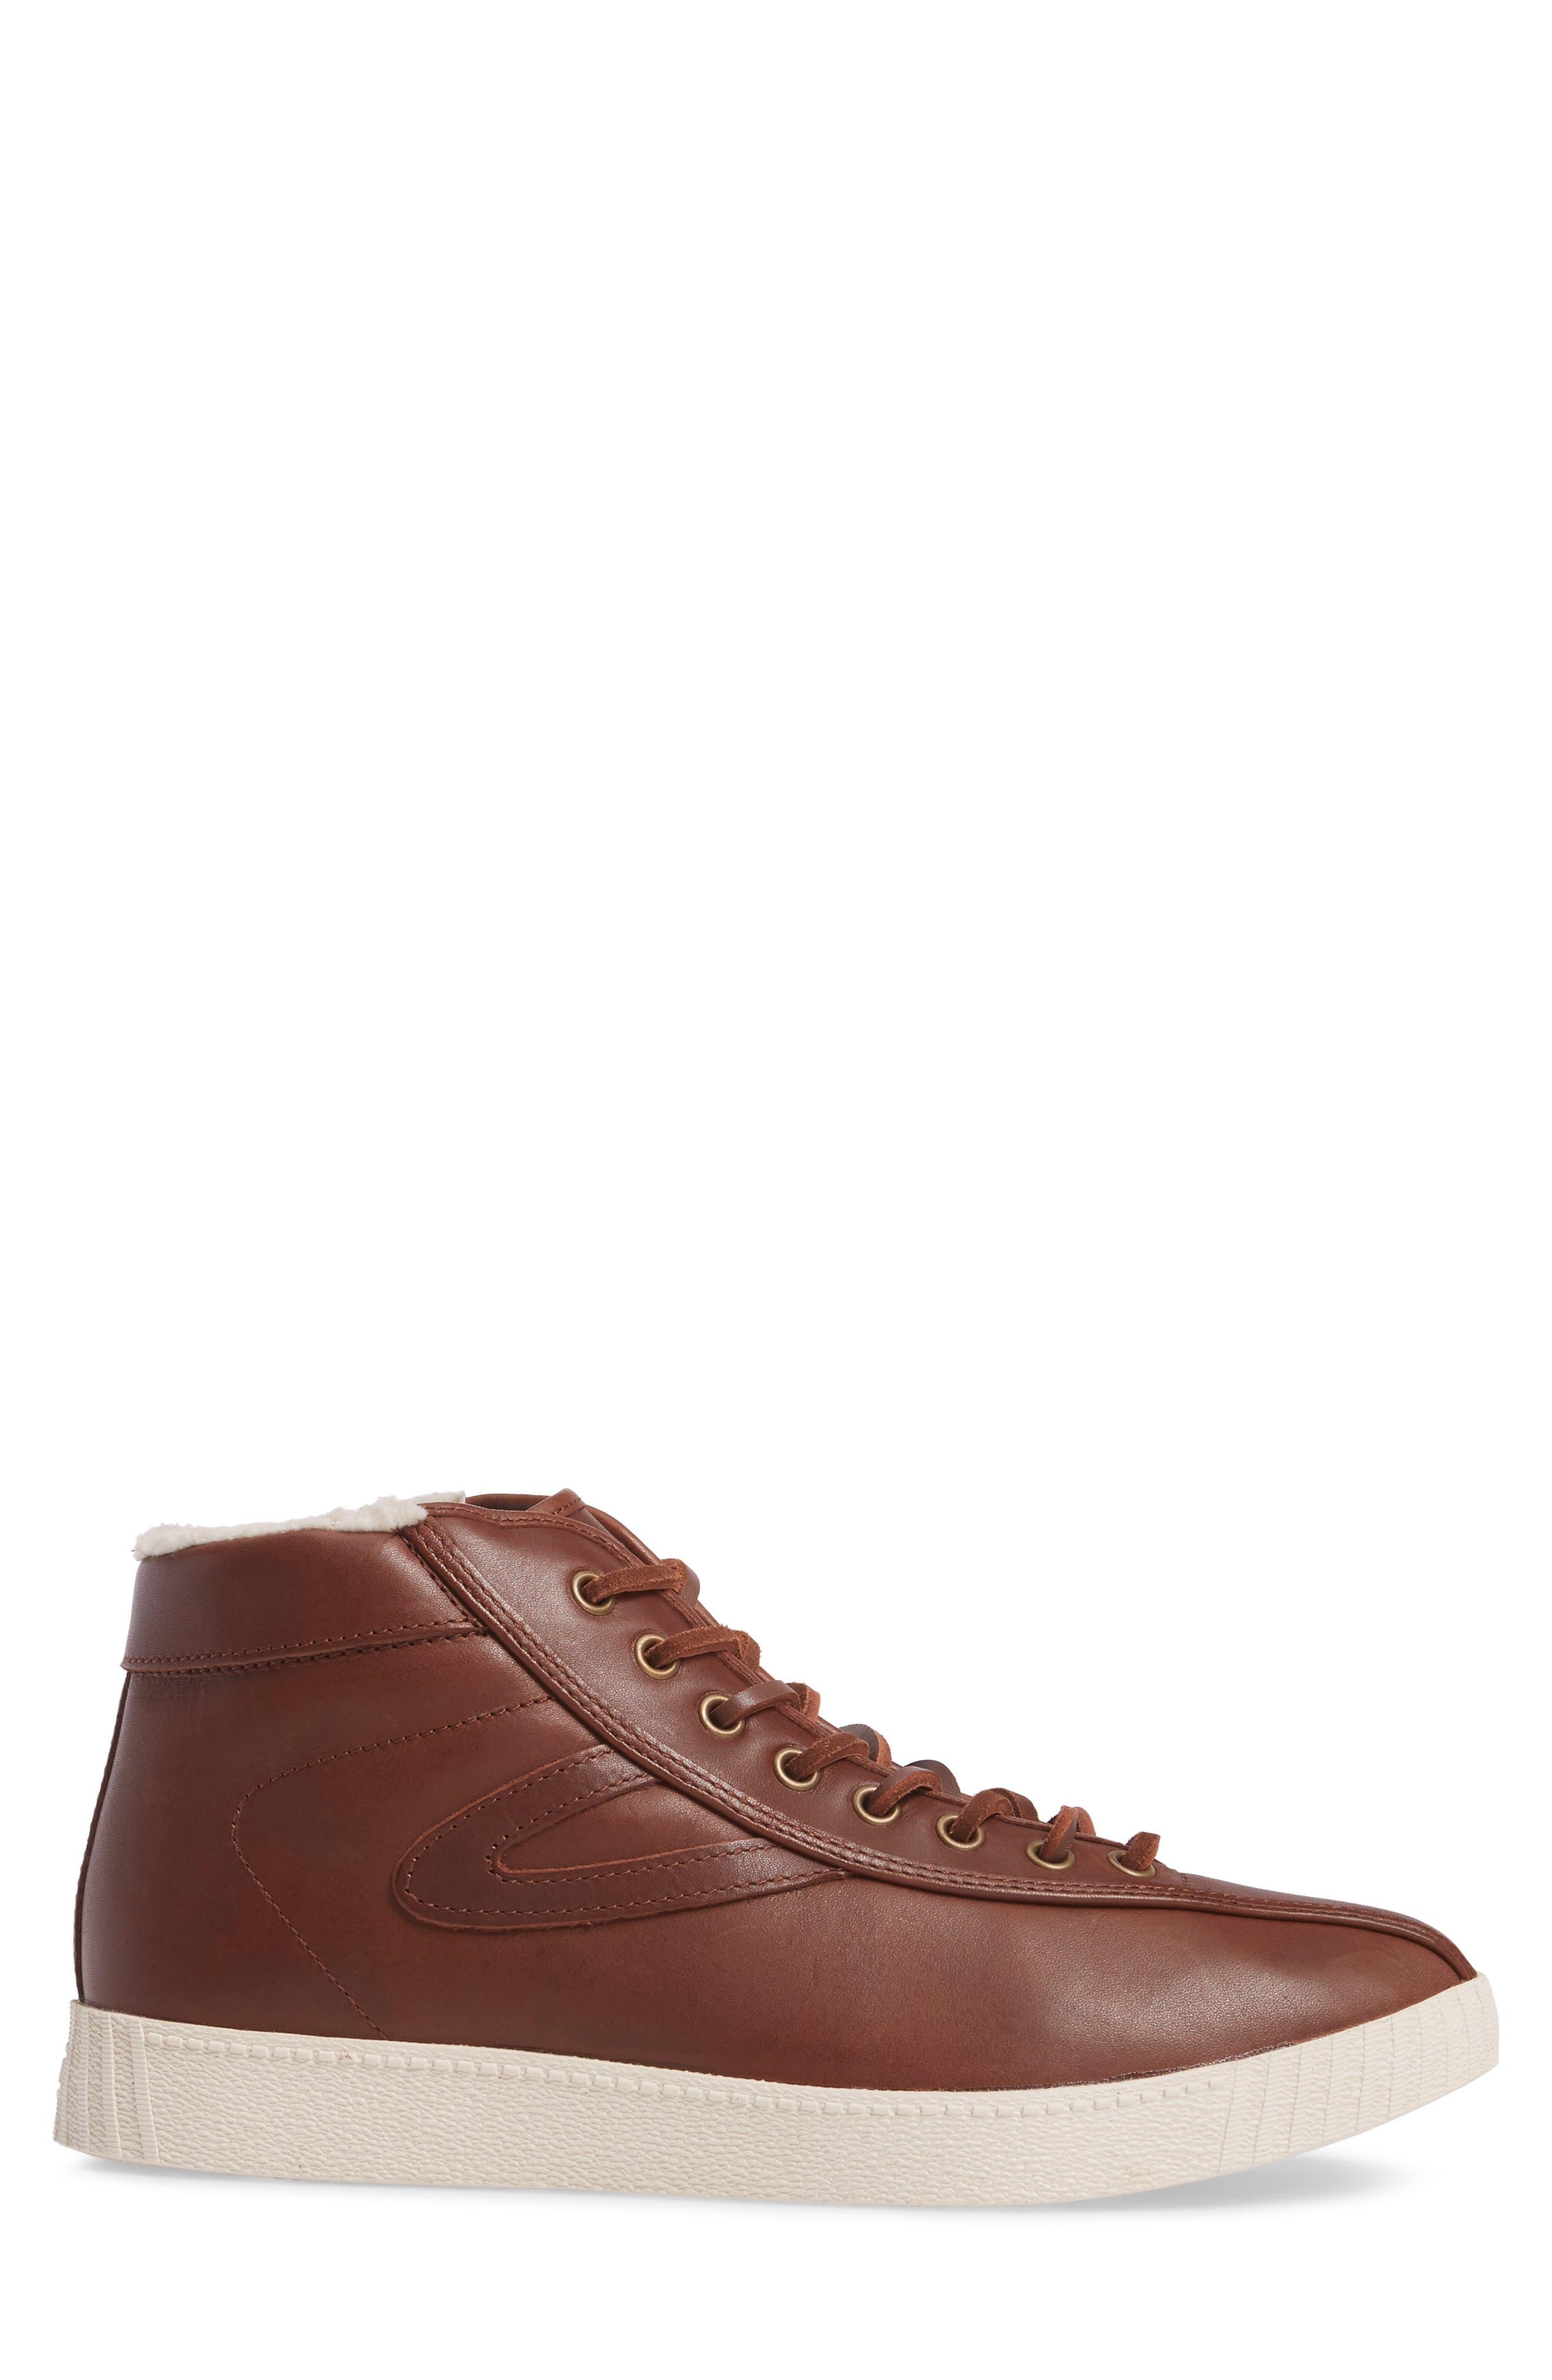 Alternate Image 3  - Tretorn Nylite Hi 2 Sneaker (Men)